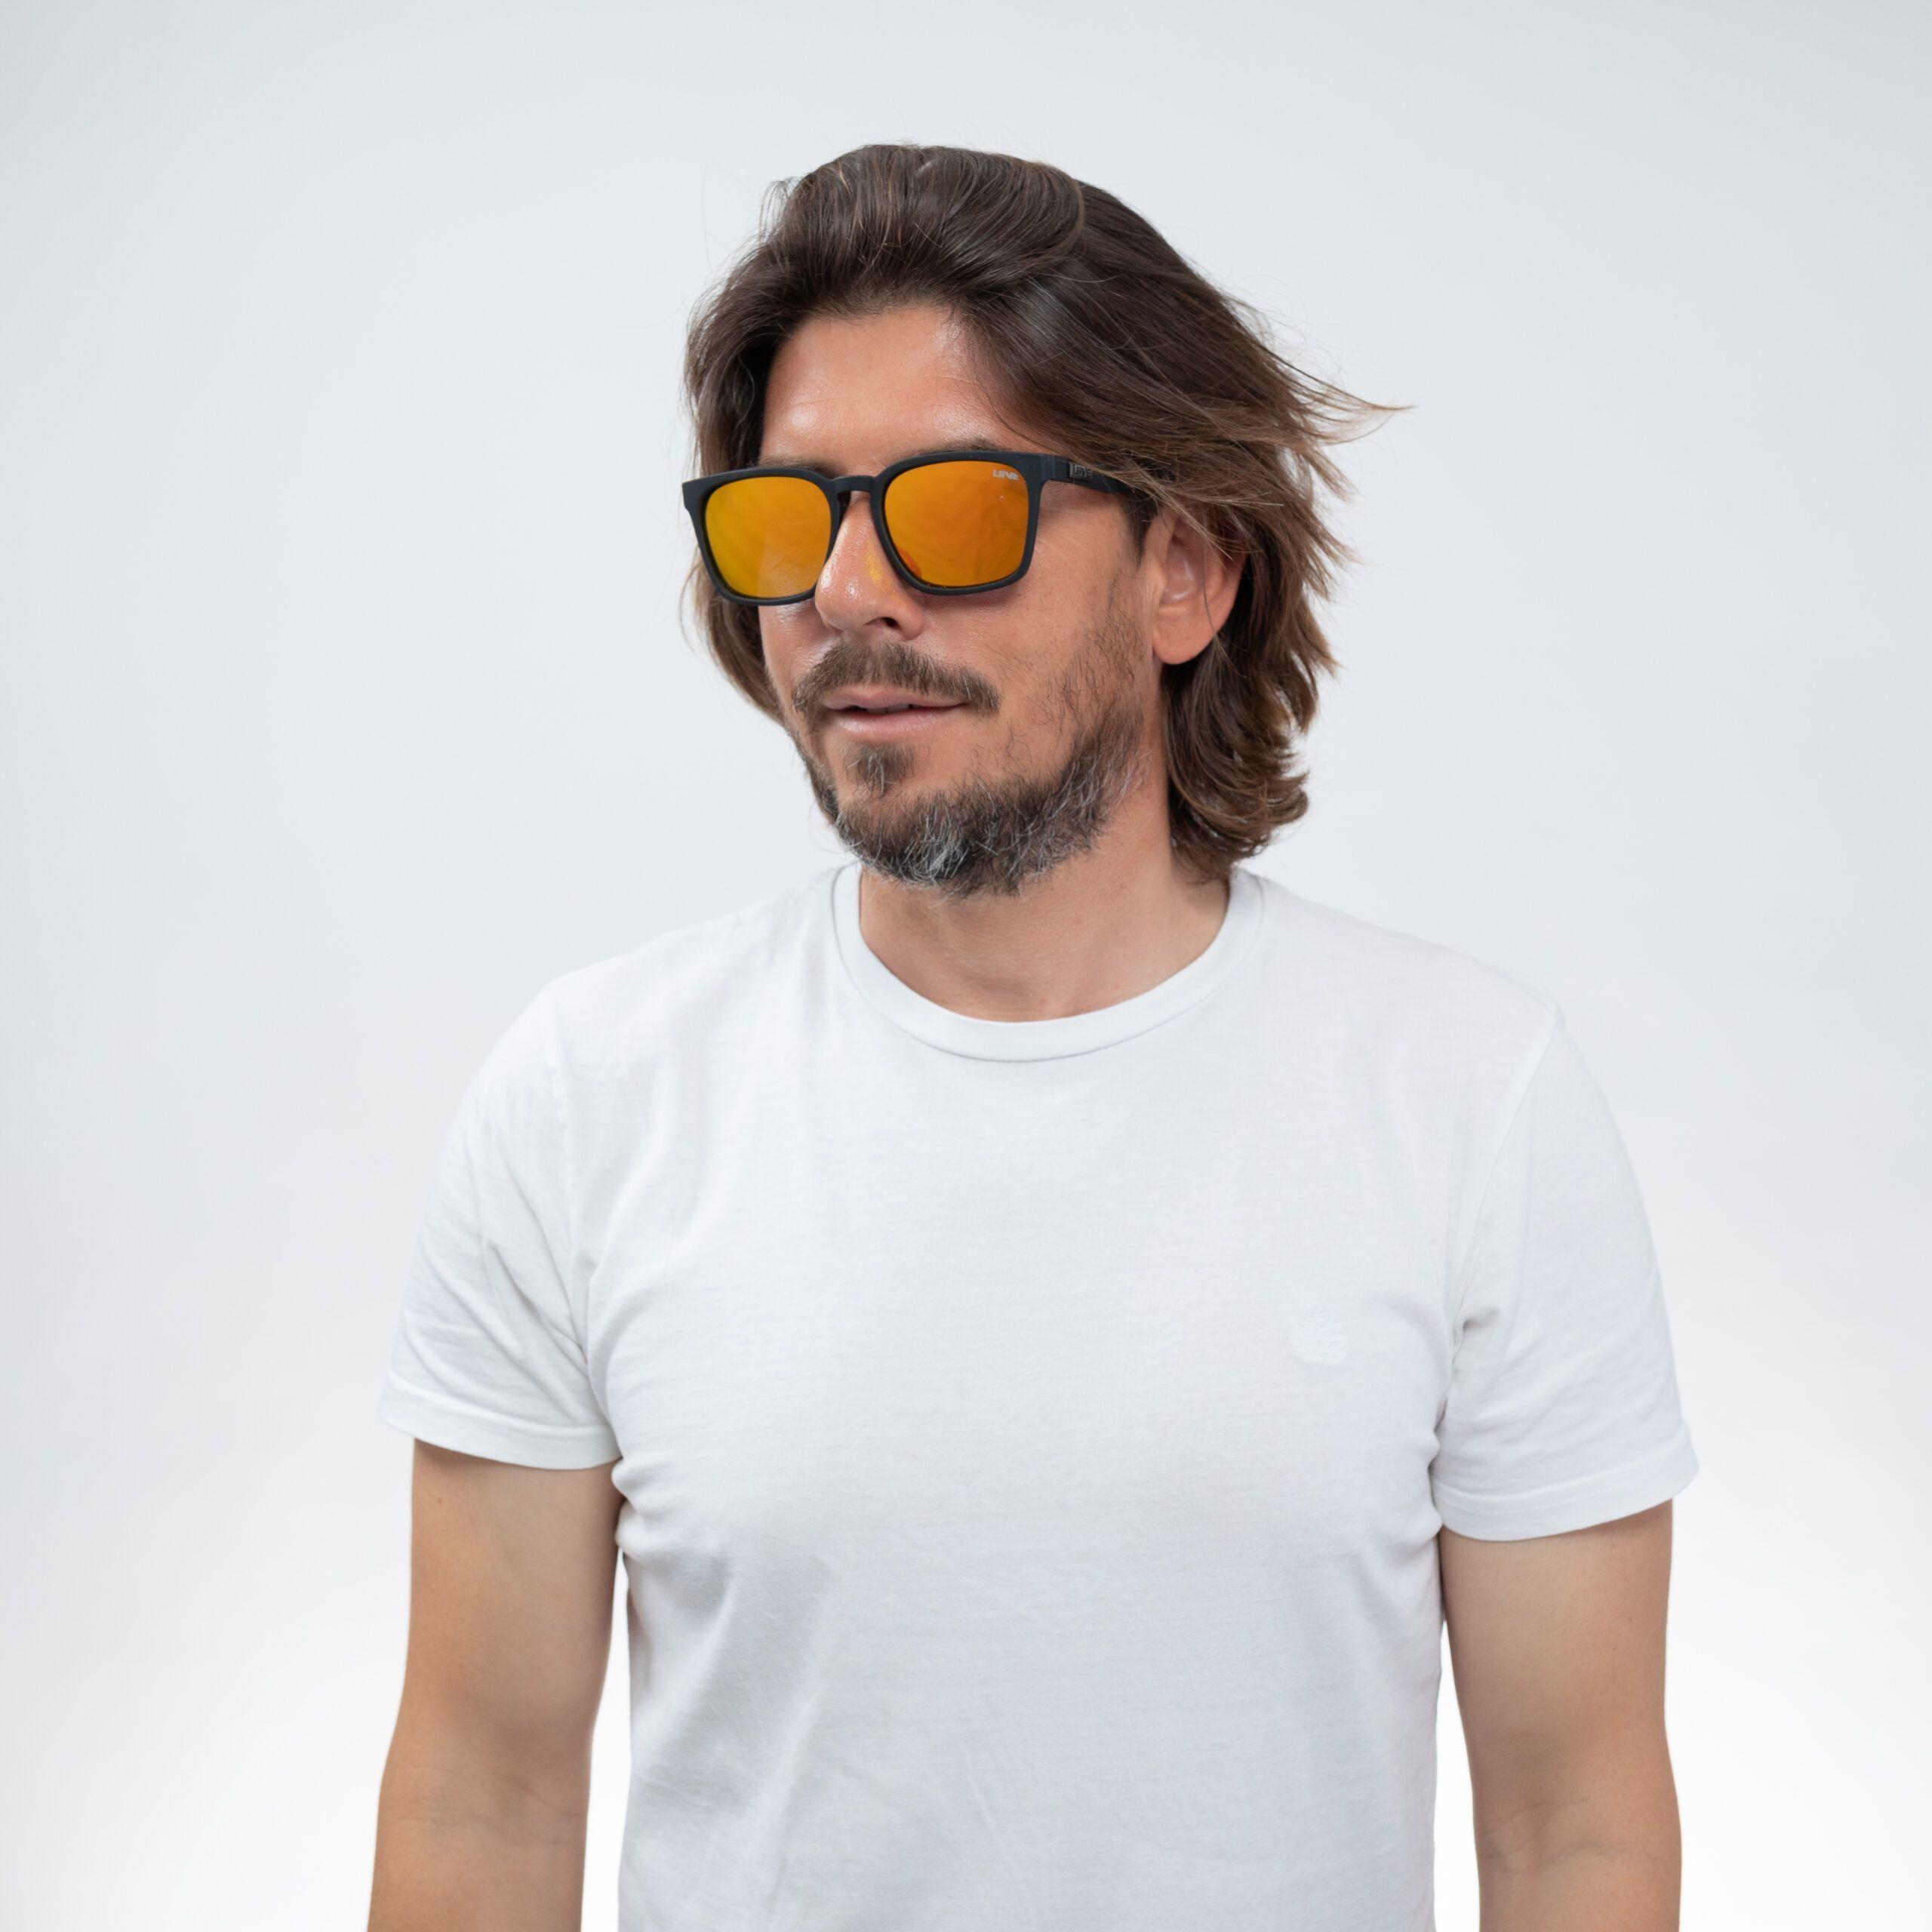 Gafas-de-sol-Liive8-scaled ALIK MIRROR POLAR MATT BLACK